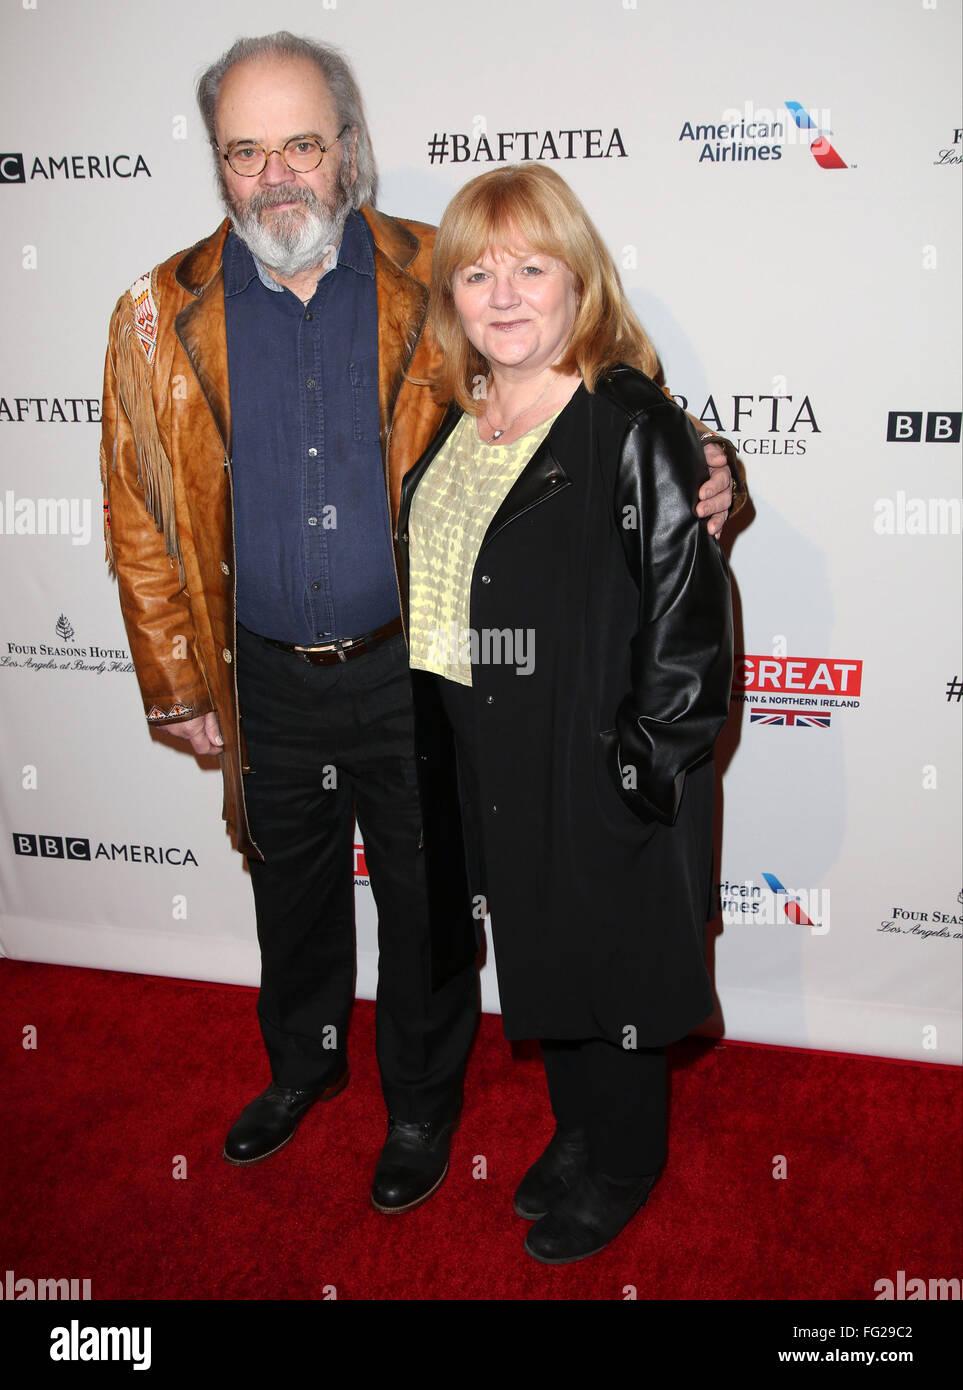 BAFTA Los Angeles Awards Season Tea at The Four Season Los Angeles - Arrivals  Featuring: Lesley Nicol, David Keith - Stock Image